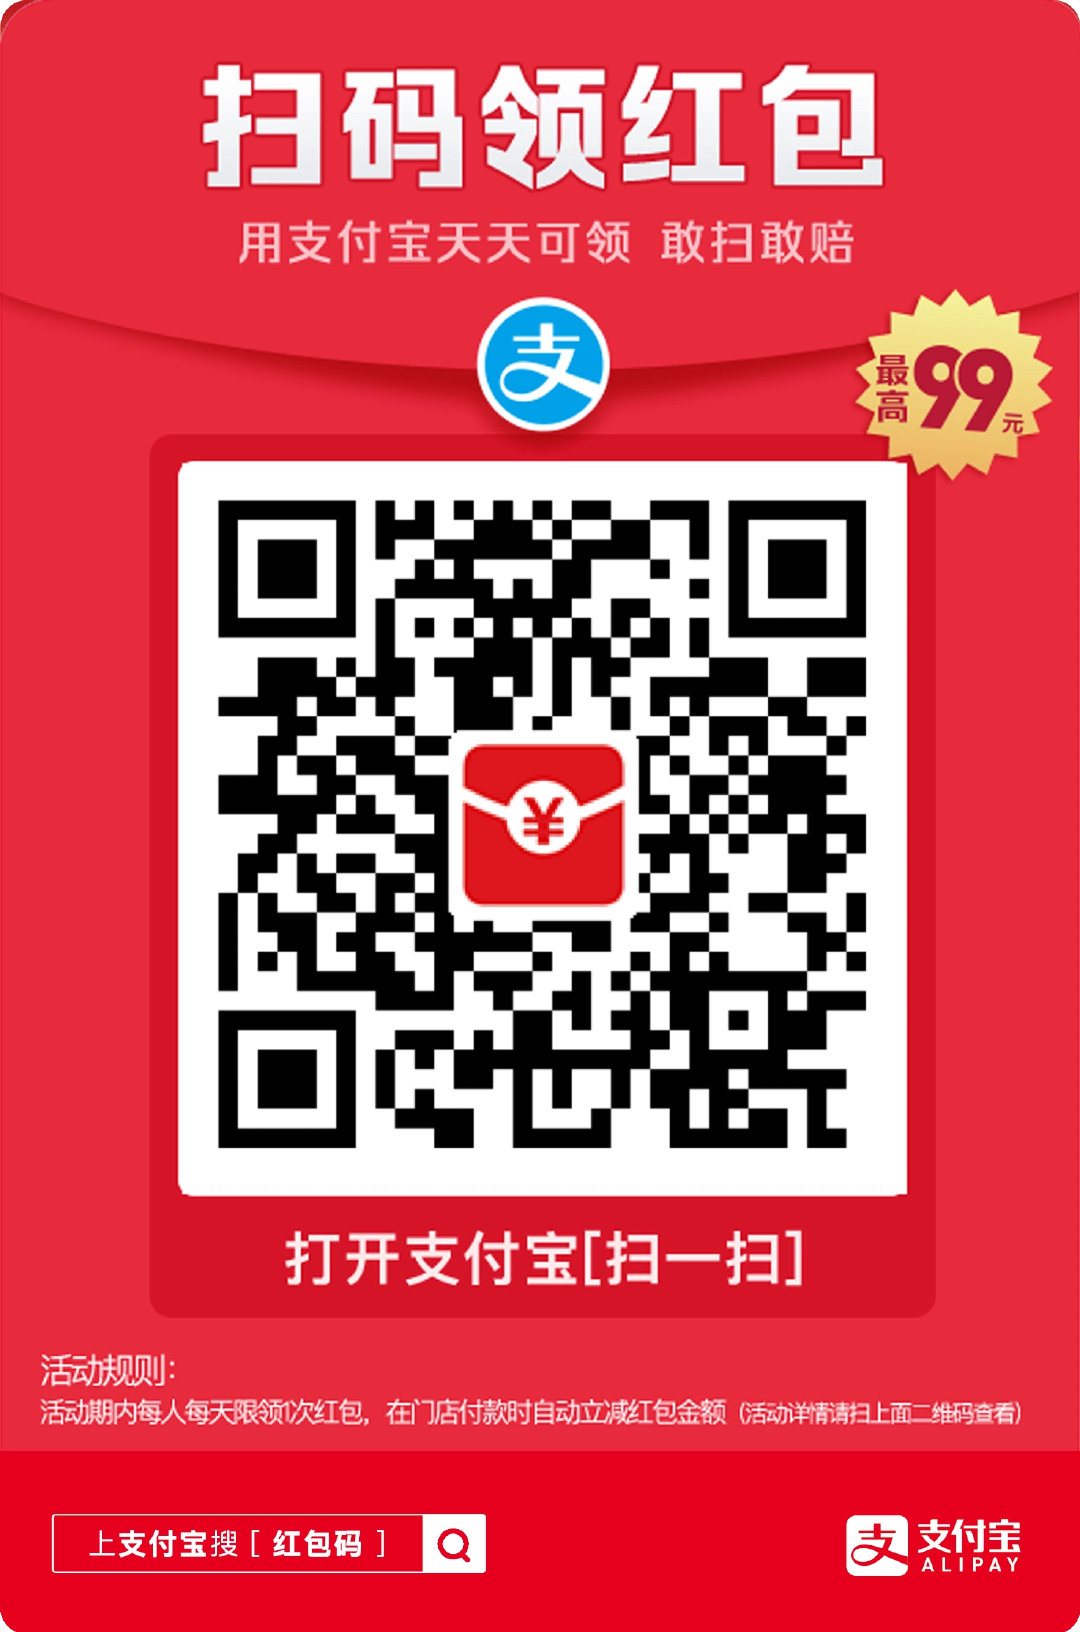 svs视频分享网手机版_svs视频分享网中文网